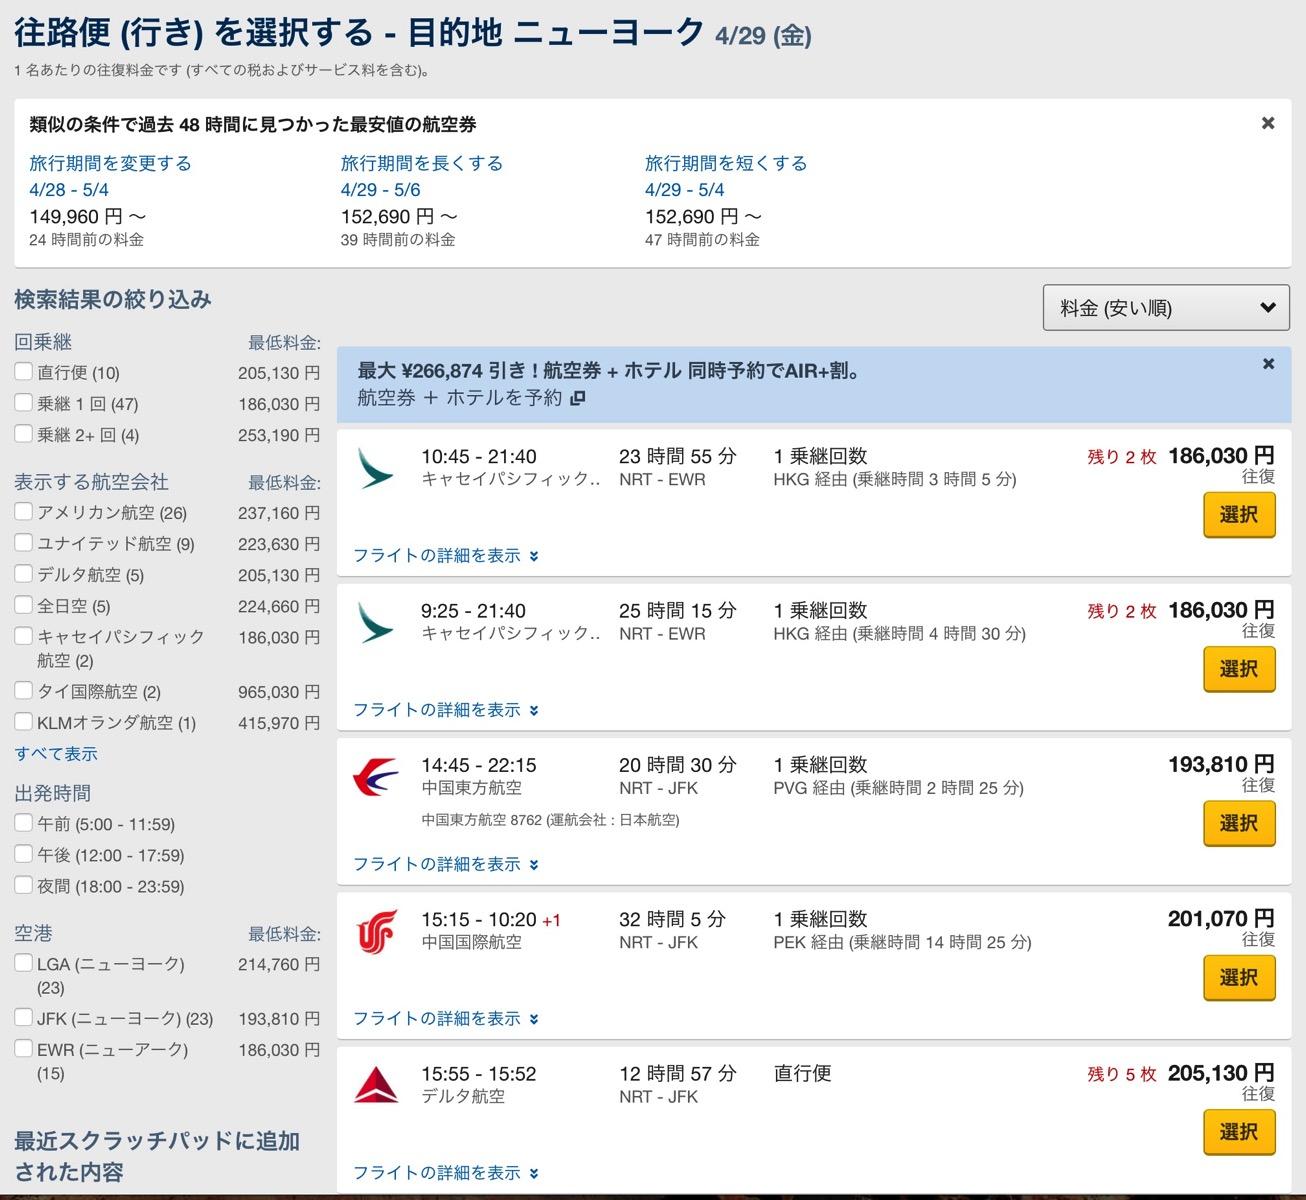 NRT 発 NYC 行き航空券 Expedia と ニューヨークへの航空券とホテルを予約するならExpediaのAIR 割がお得